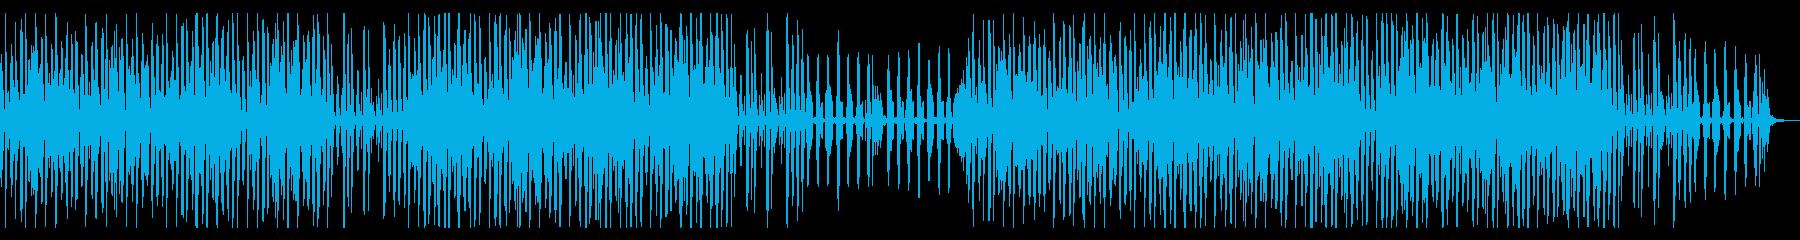 NaturalTalkの再生済みの波形